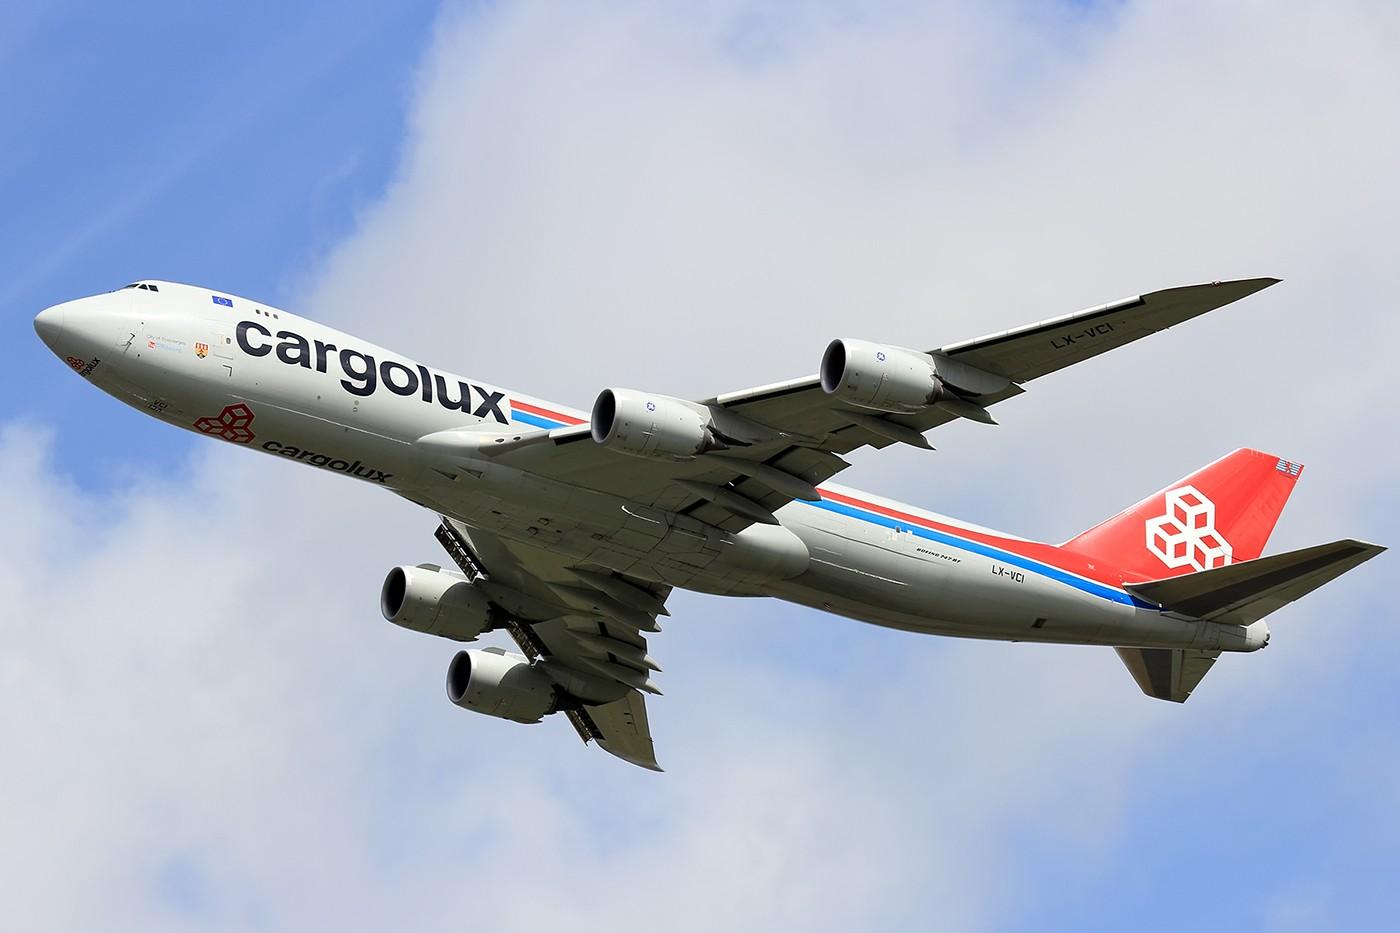 Re:[原创]【AMS】阿姆斯特丹常规卡狗一组 1400*933 BOEING 747-8F LX-VCI 荷兰阿姆斯特丹史基浦机场